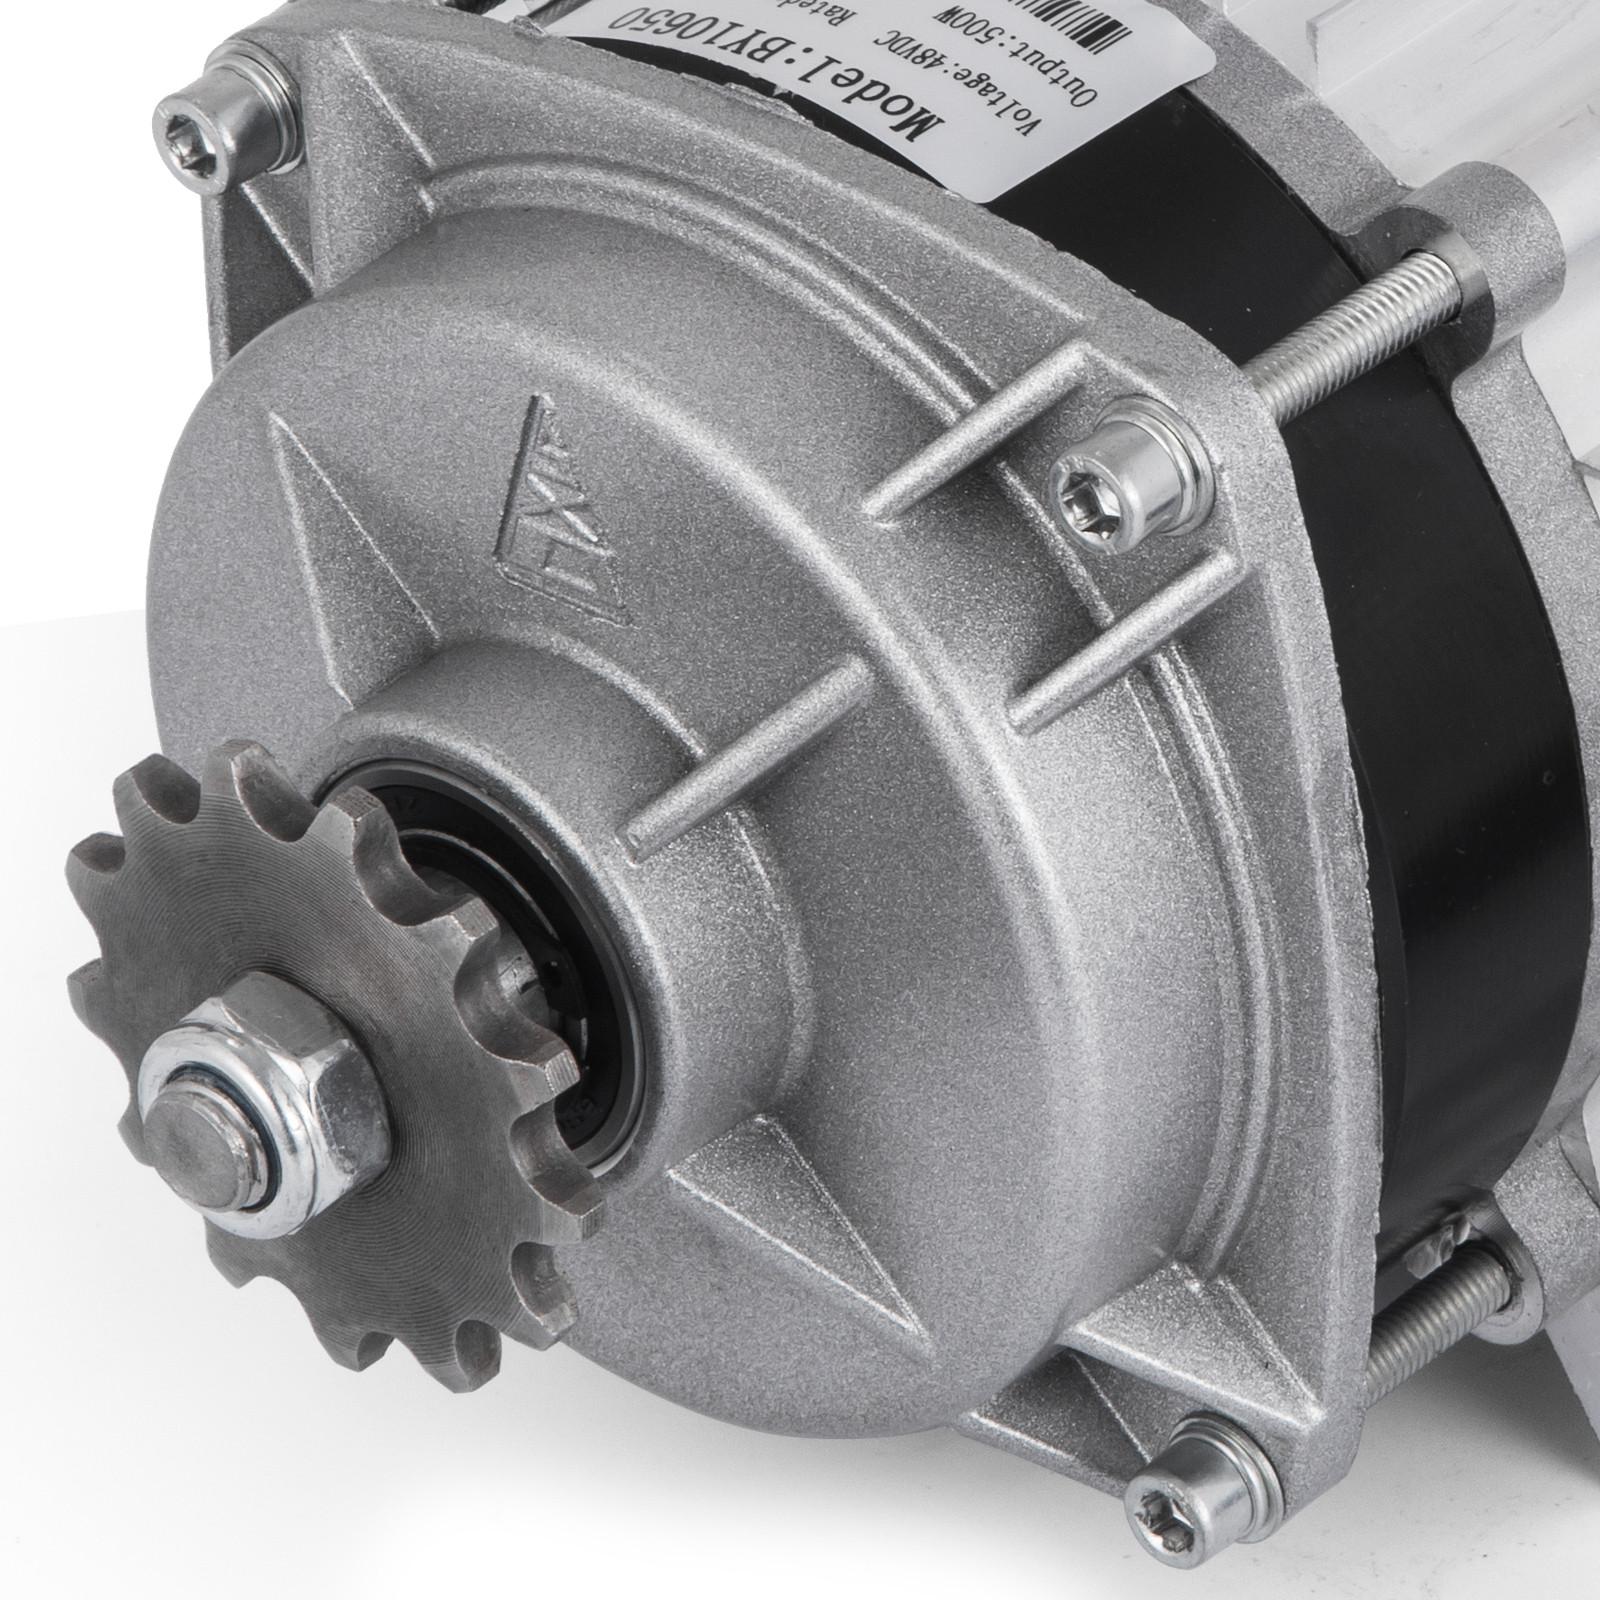 1800W-48V-DC-Brushless-Electric-Motor-Kit-f-Scooter-500-1800W-E-Bike-Go-Kart thumbnail 141